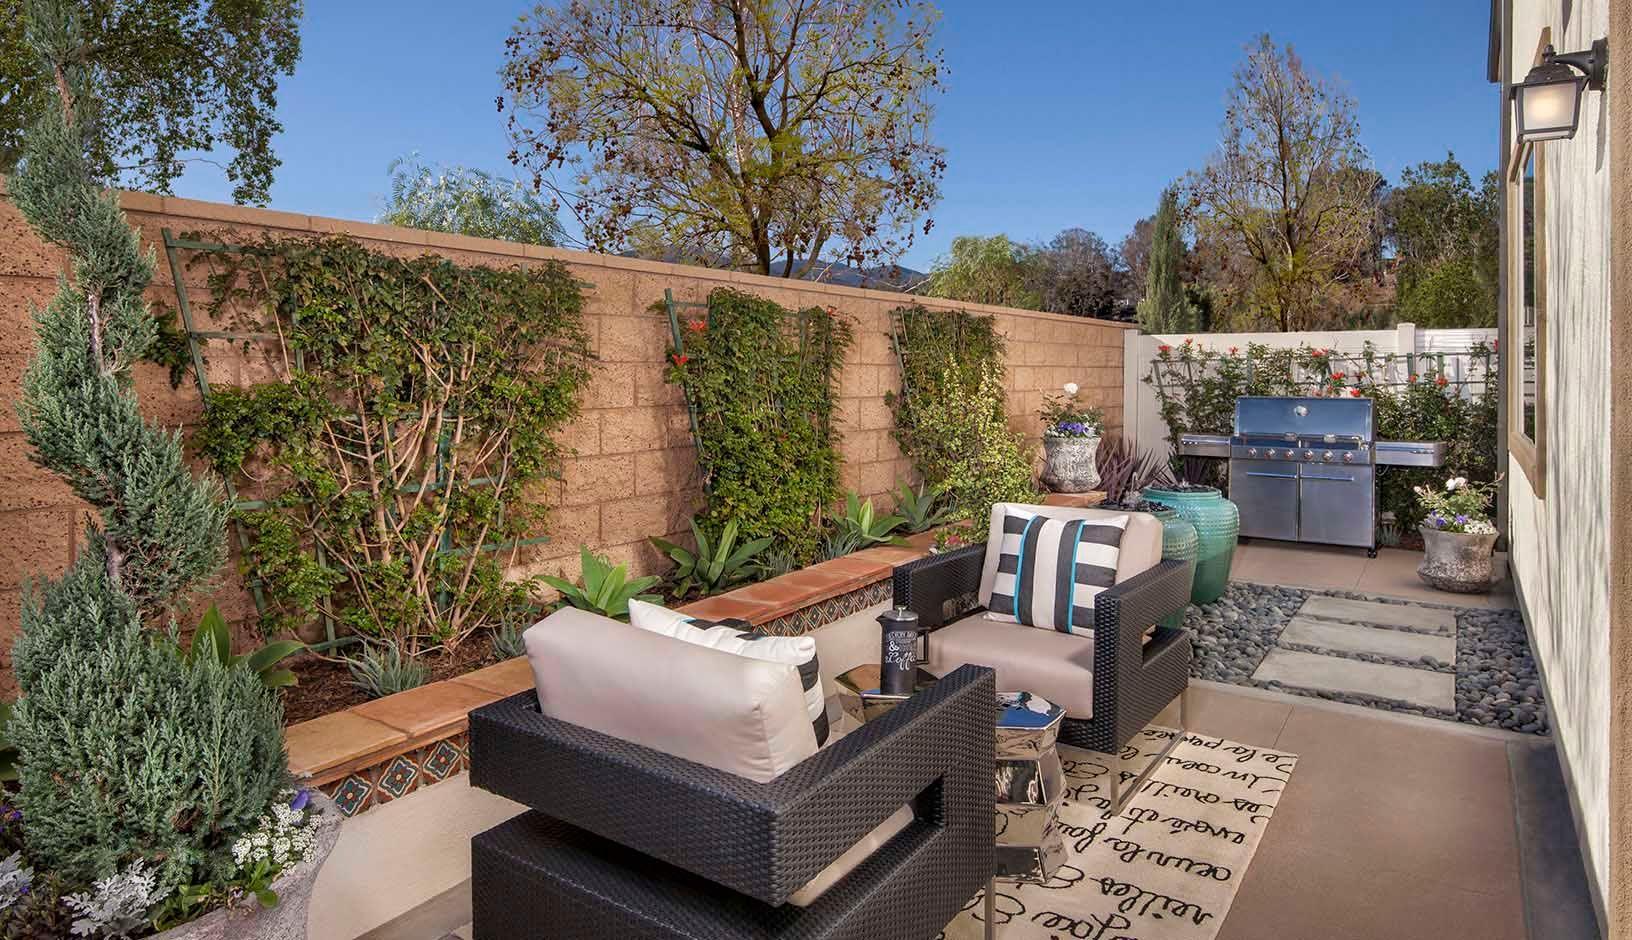 Single Family for Sale at Terrassa Court - Residence 2 2899 Villa Catalonia Court Corona, California 92881 United States